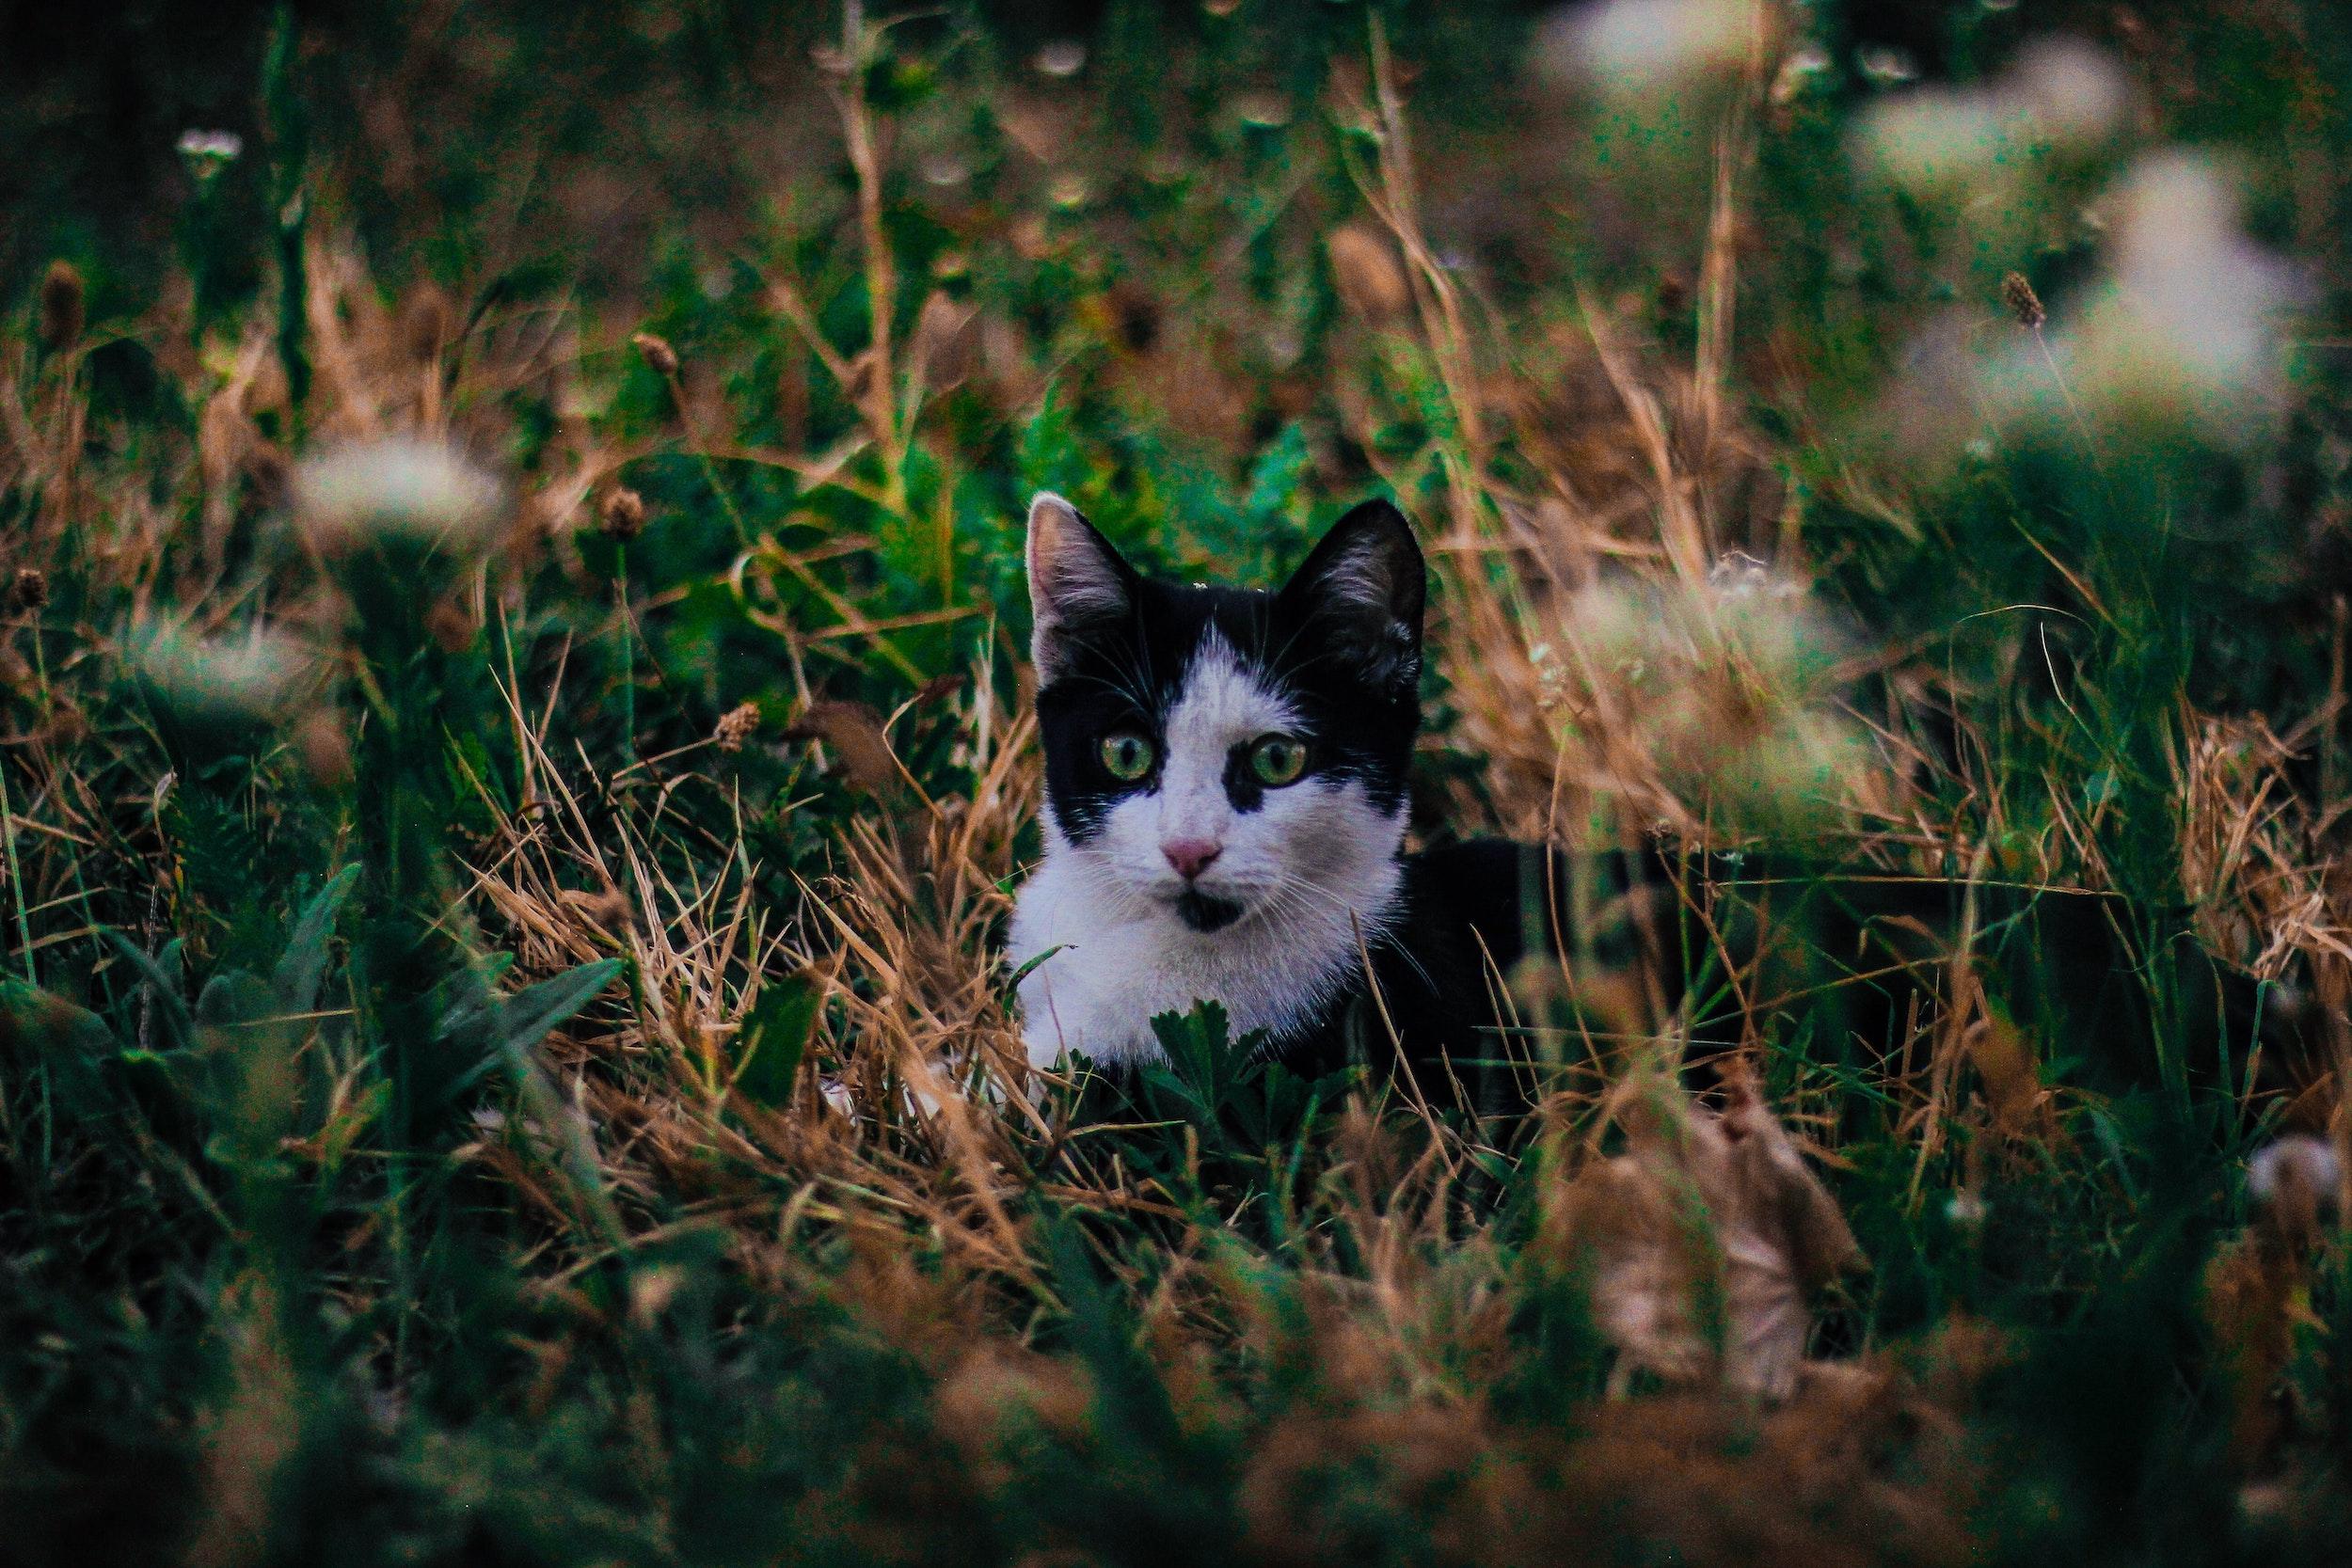 Photo byElion JasharionUnsplash | A curious cat in Šar mountains, North Macedonia